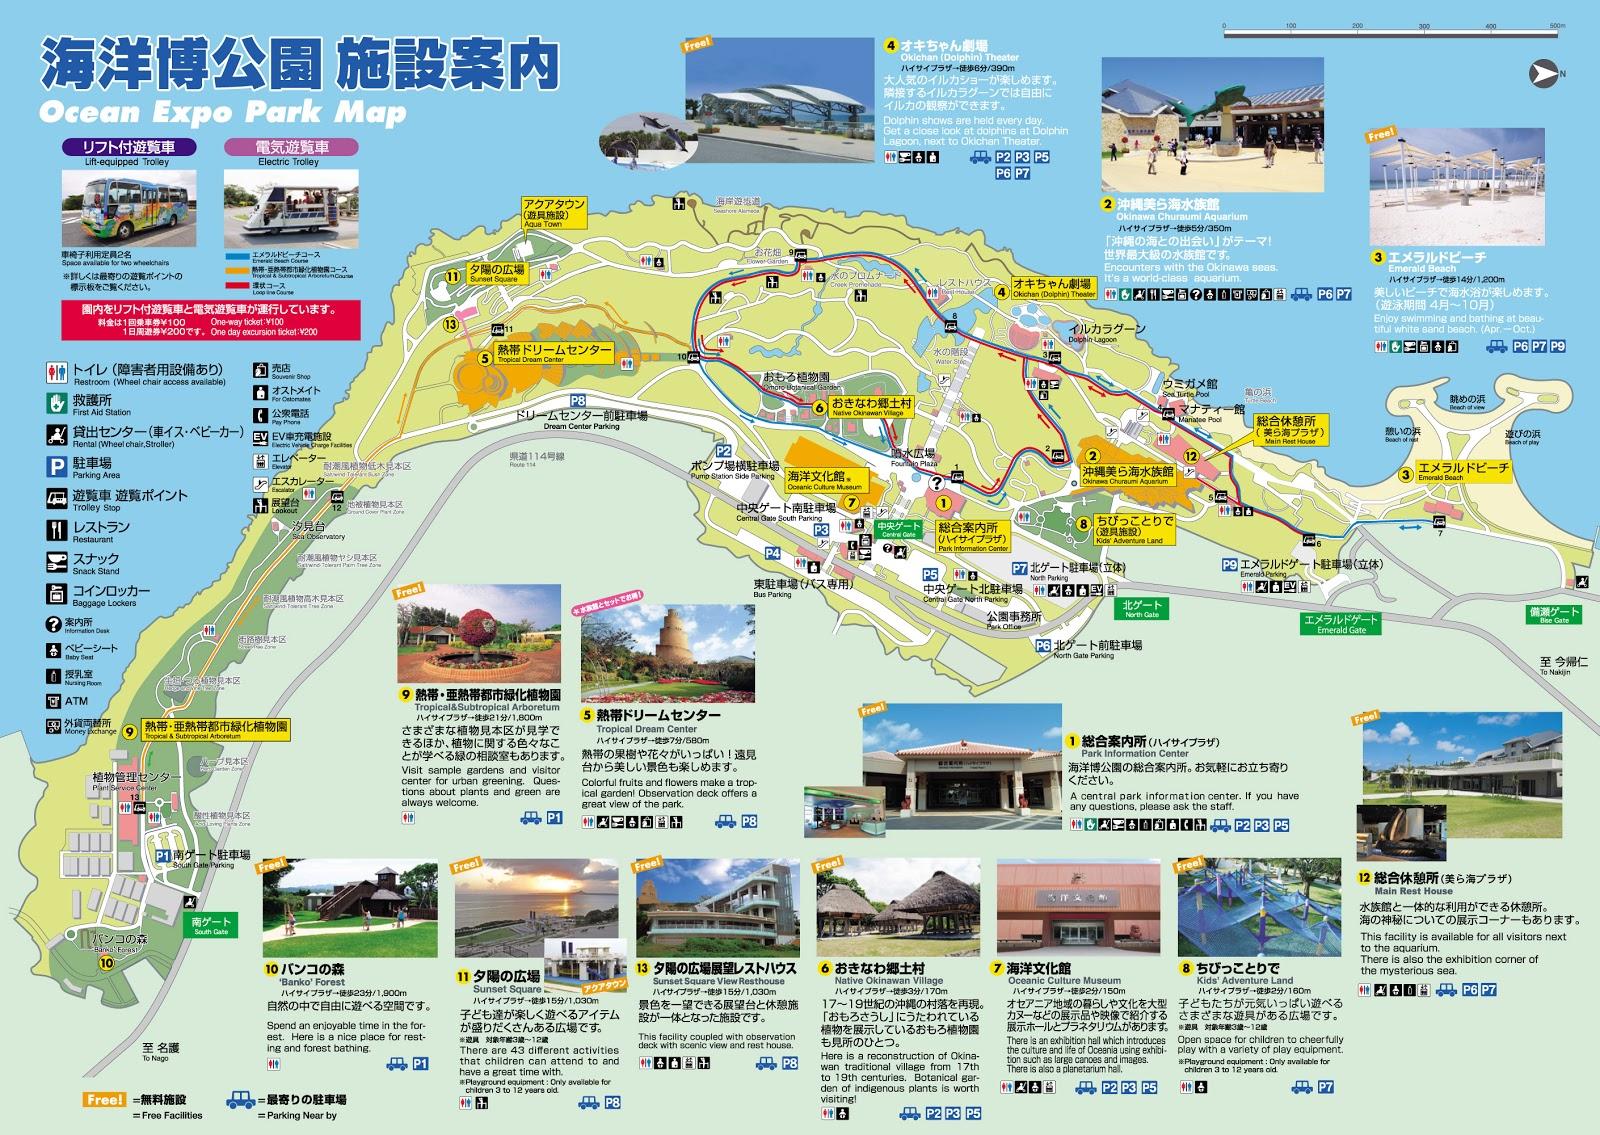 Okinawa Churaumi Aquarium Okinawa Japan Blue Moon Travel Blog Self Travel Backpack